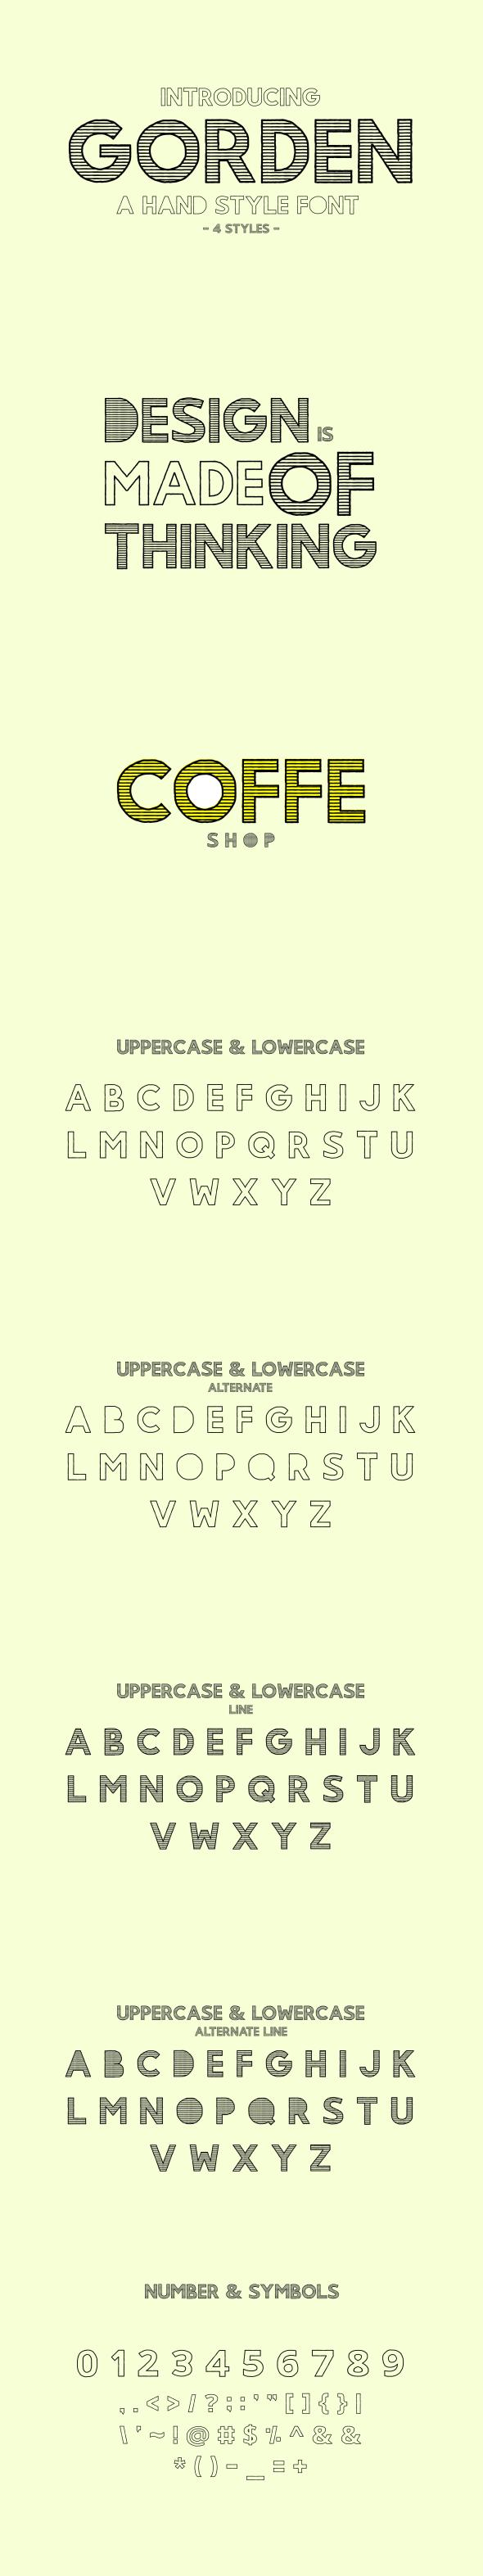 Gorden | A Hand Style Font - Hand-writing Script